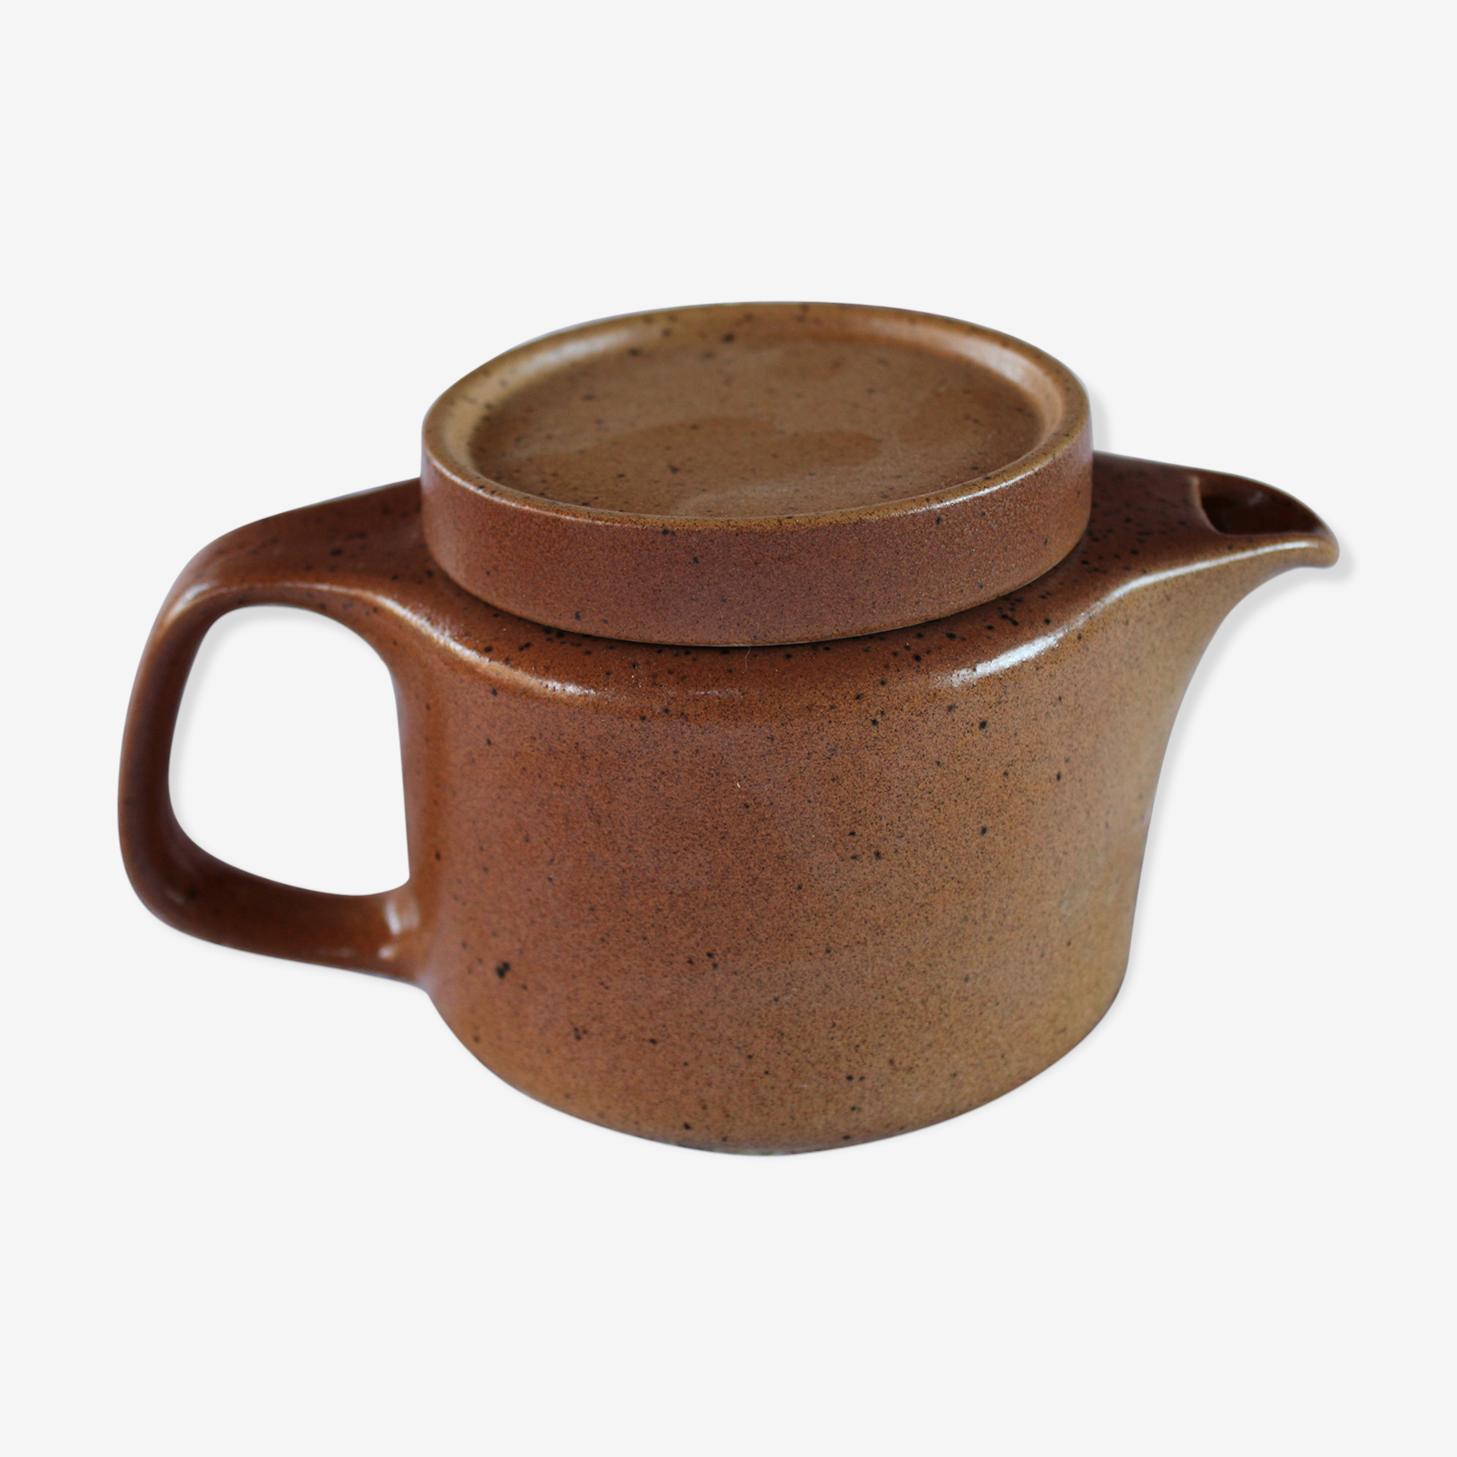 Stoneware teapot signed